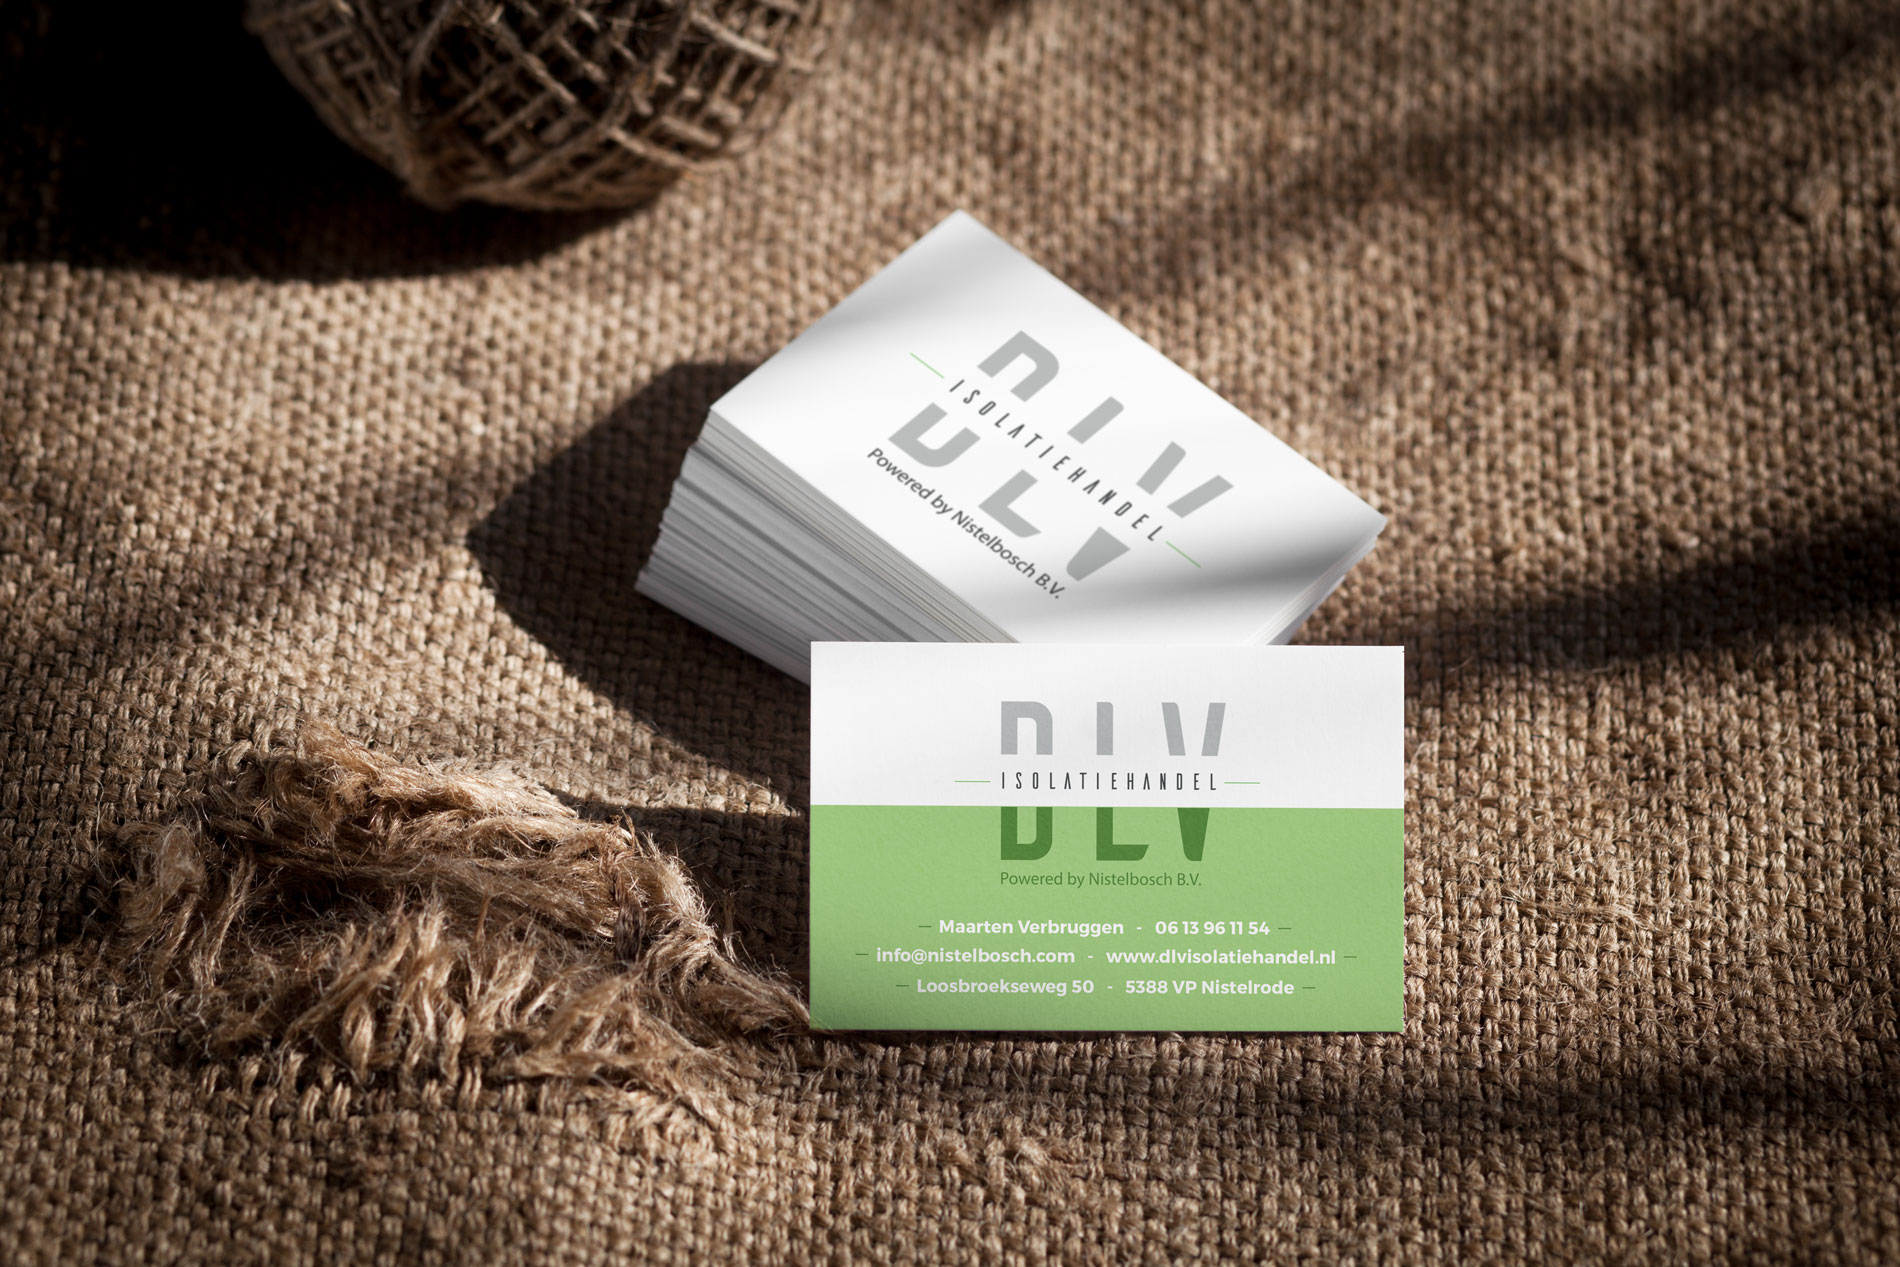 dlv-isolatiehandel-business-cards